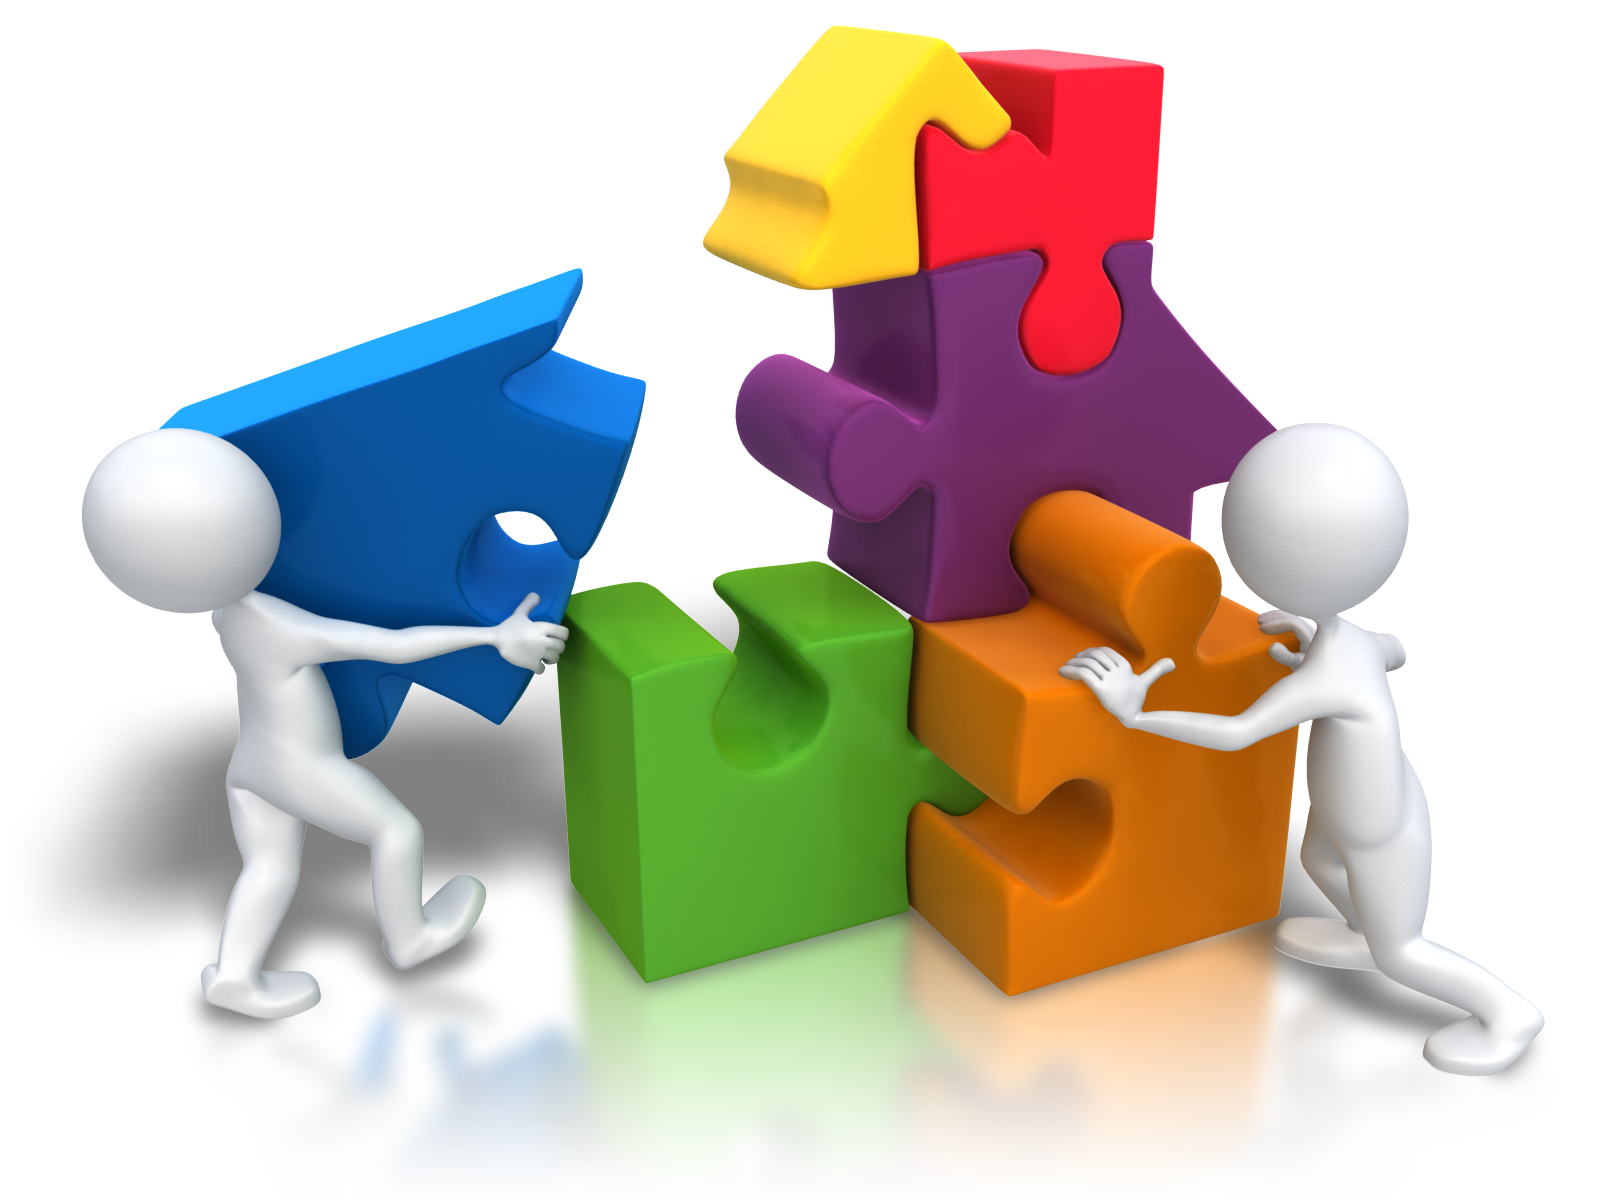 teamwork case study solutions